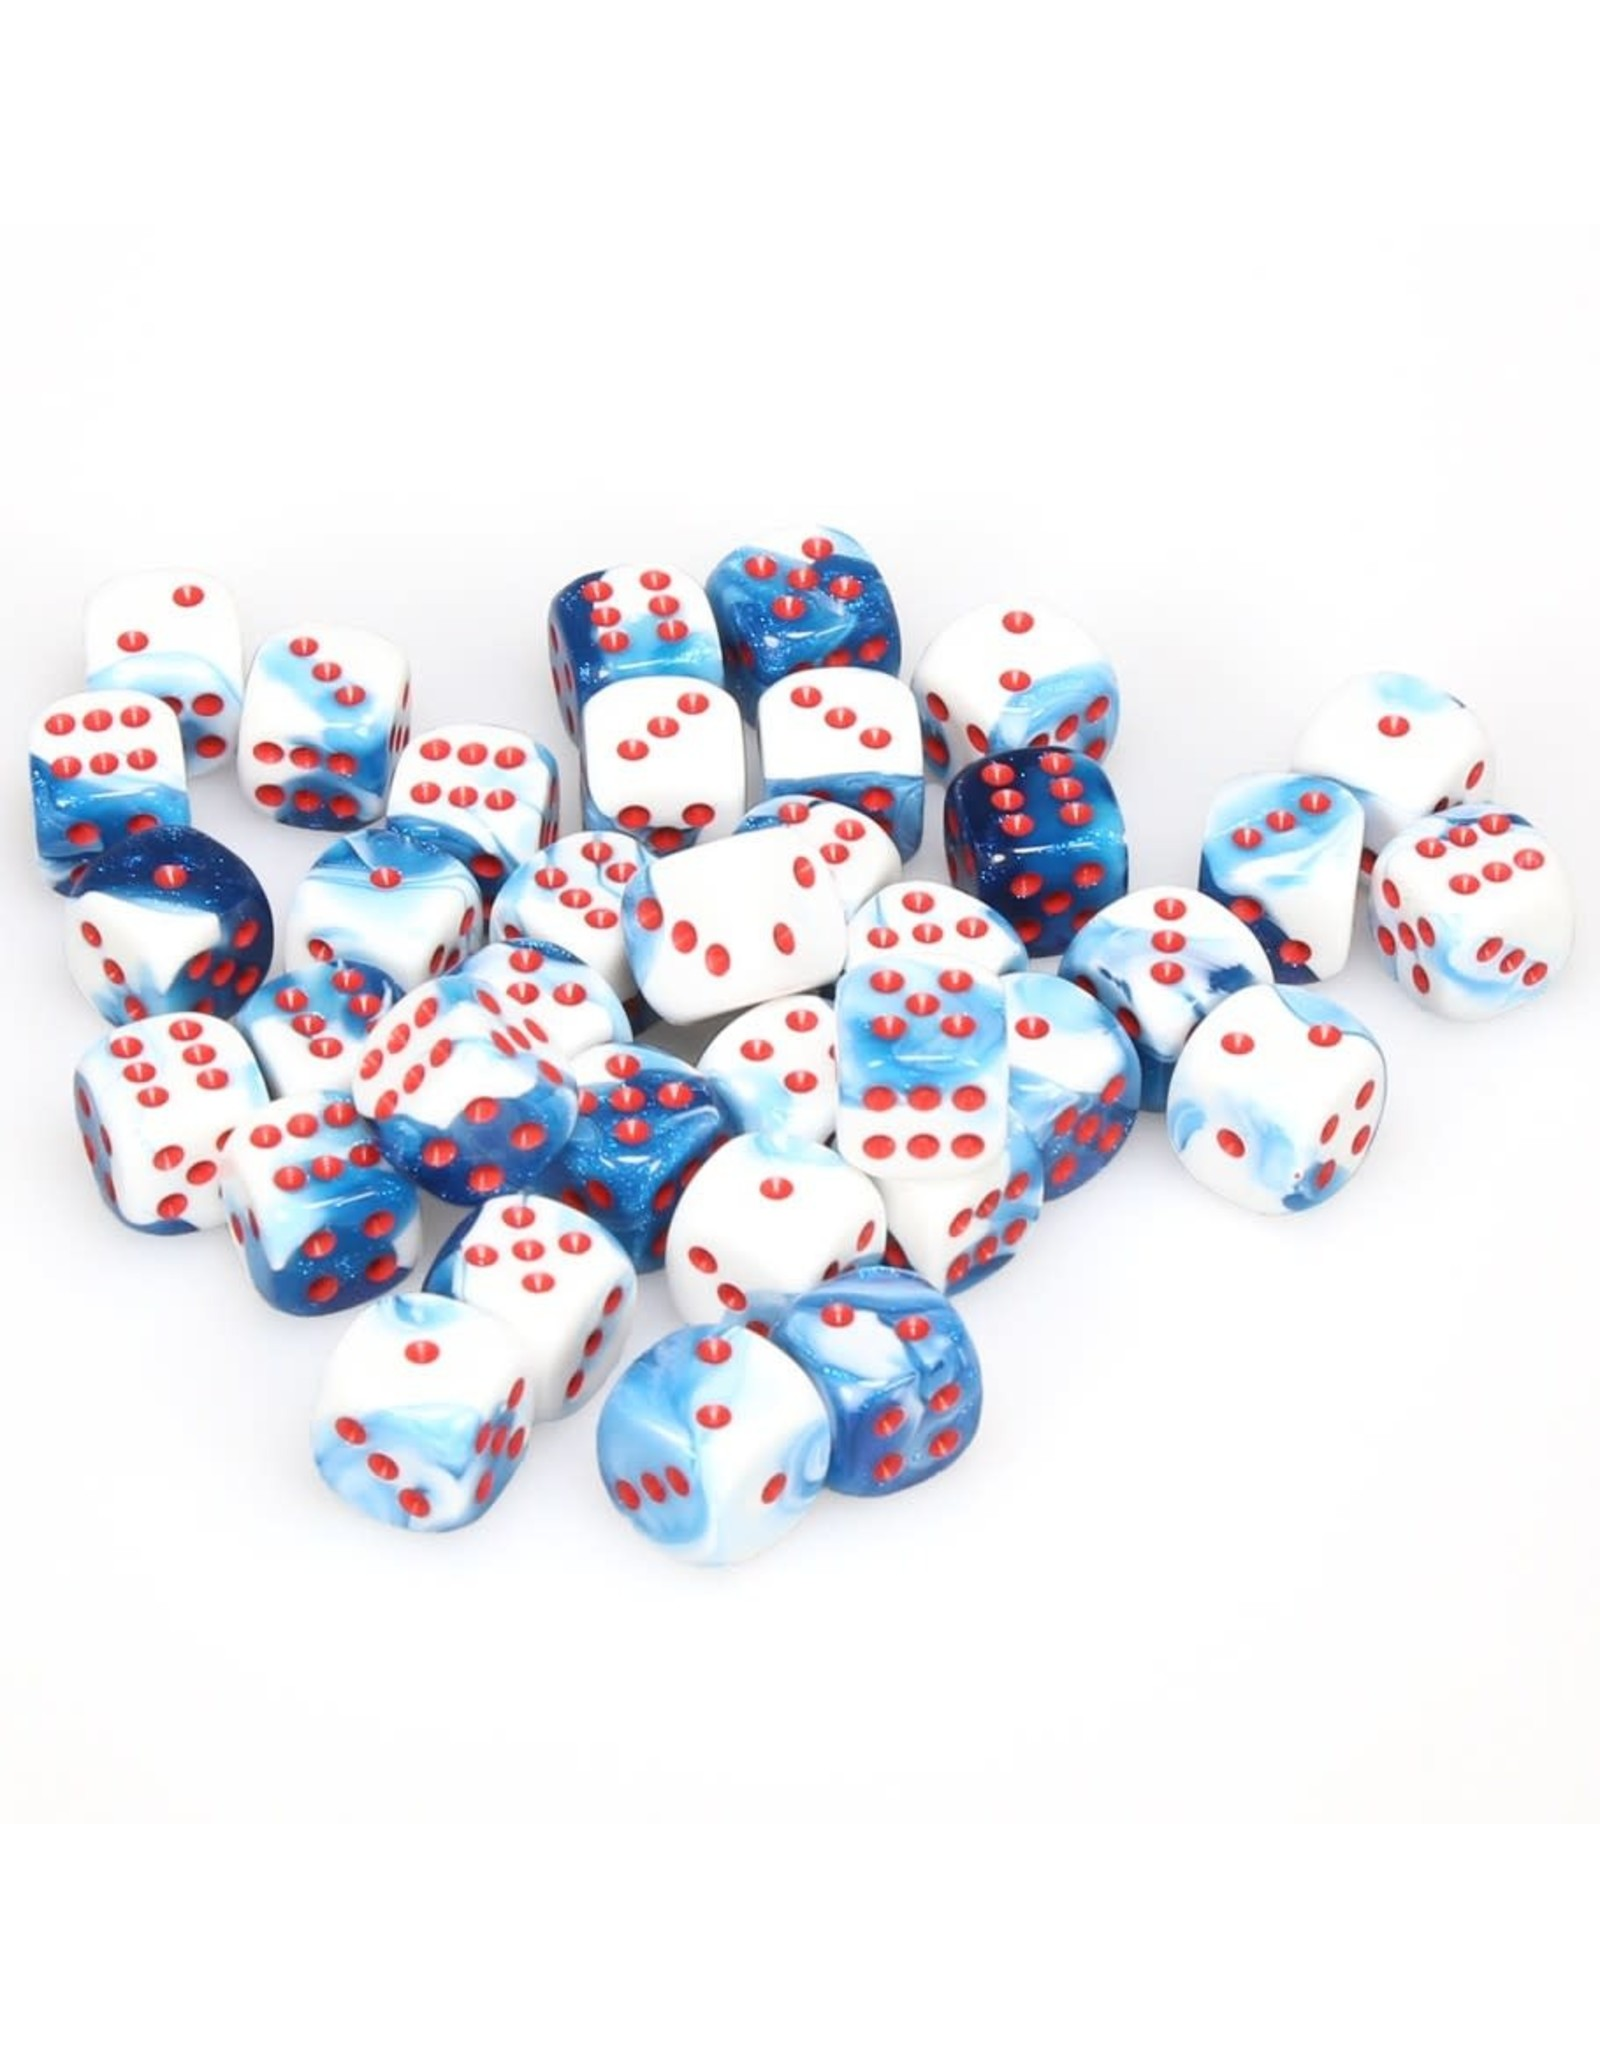 Chessex d6Cube12mmGemini#7 Astral BUWHrd (36)